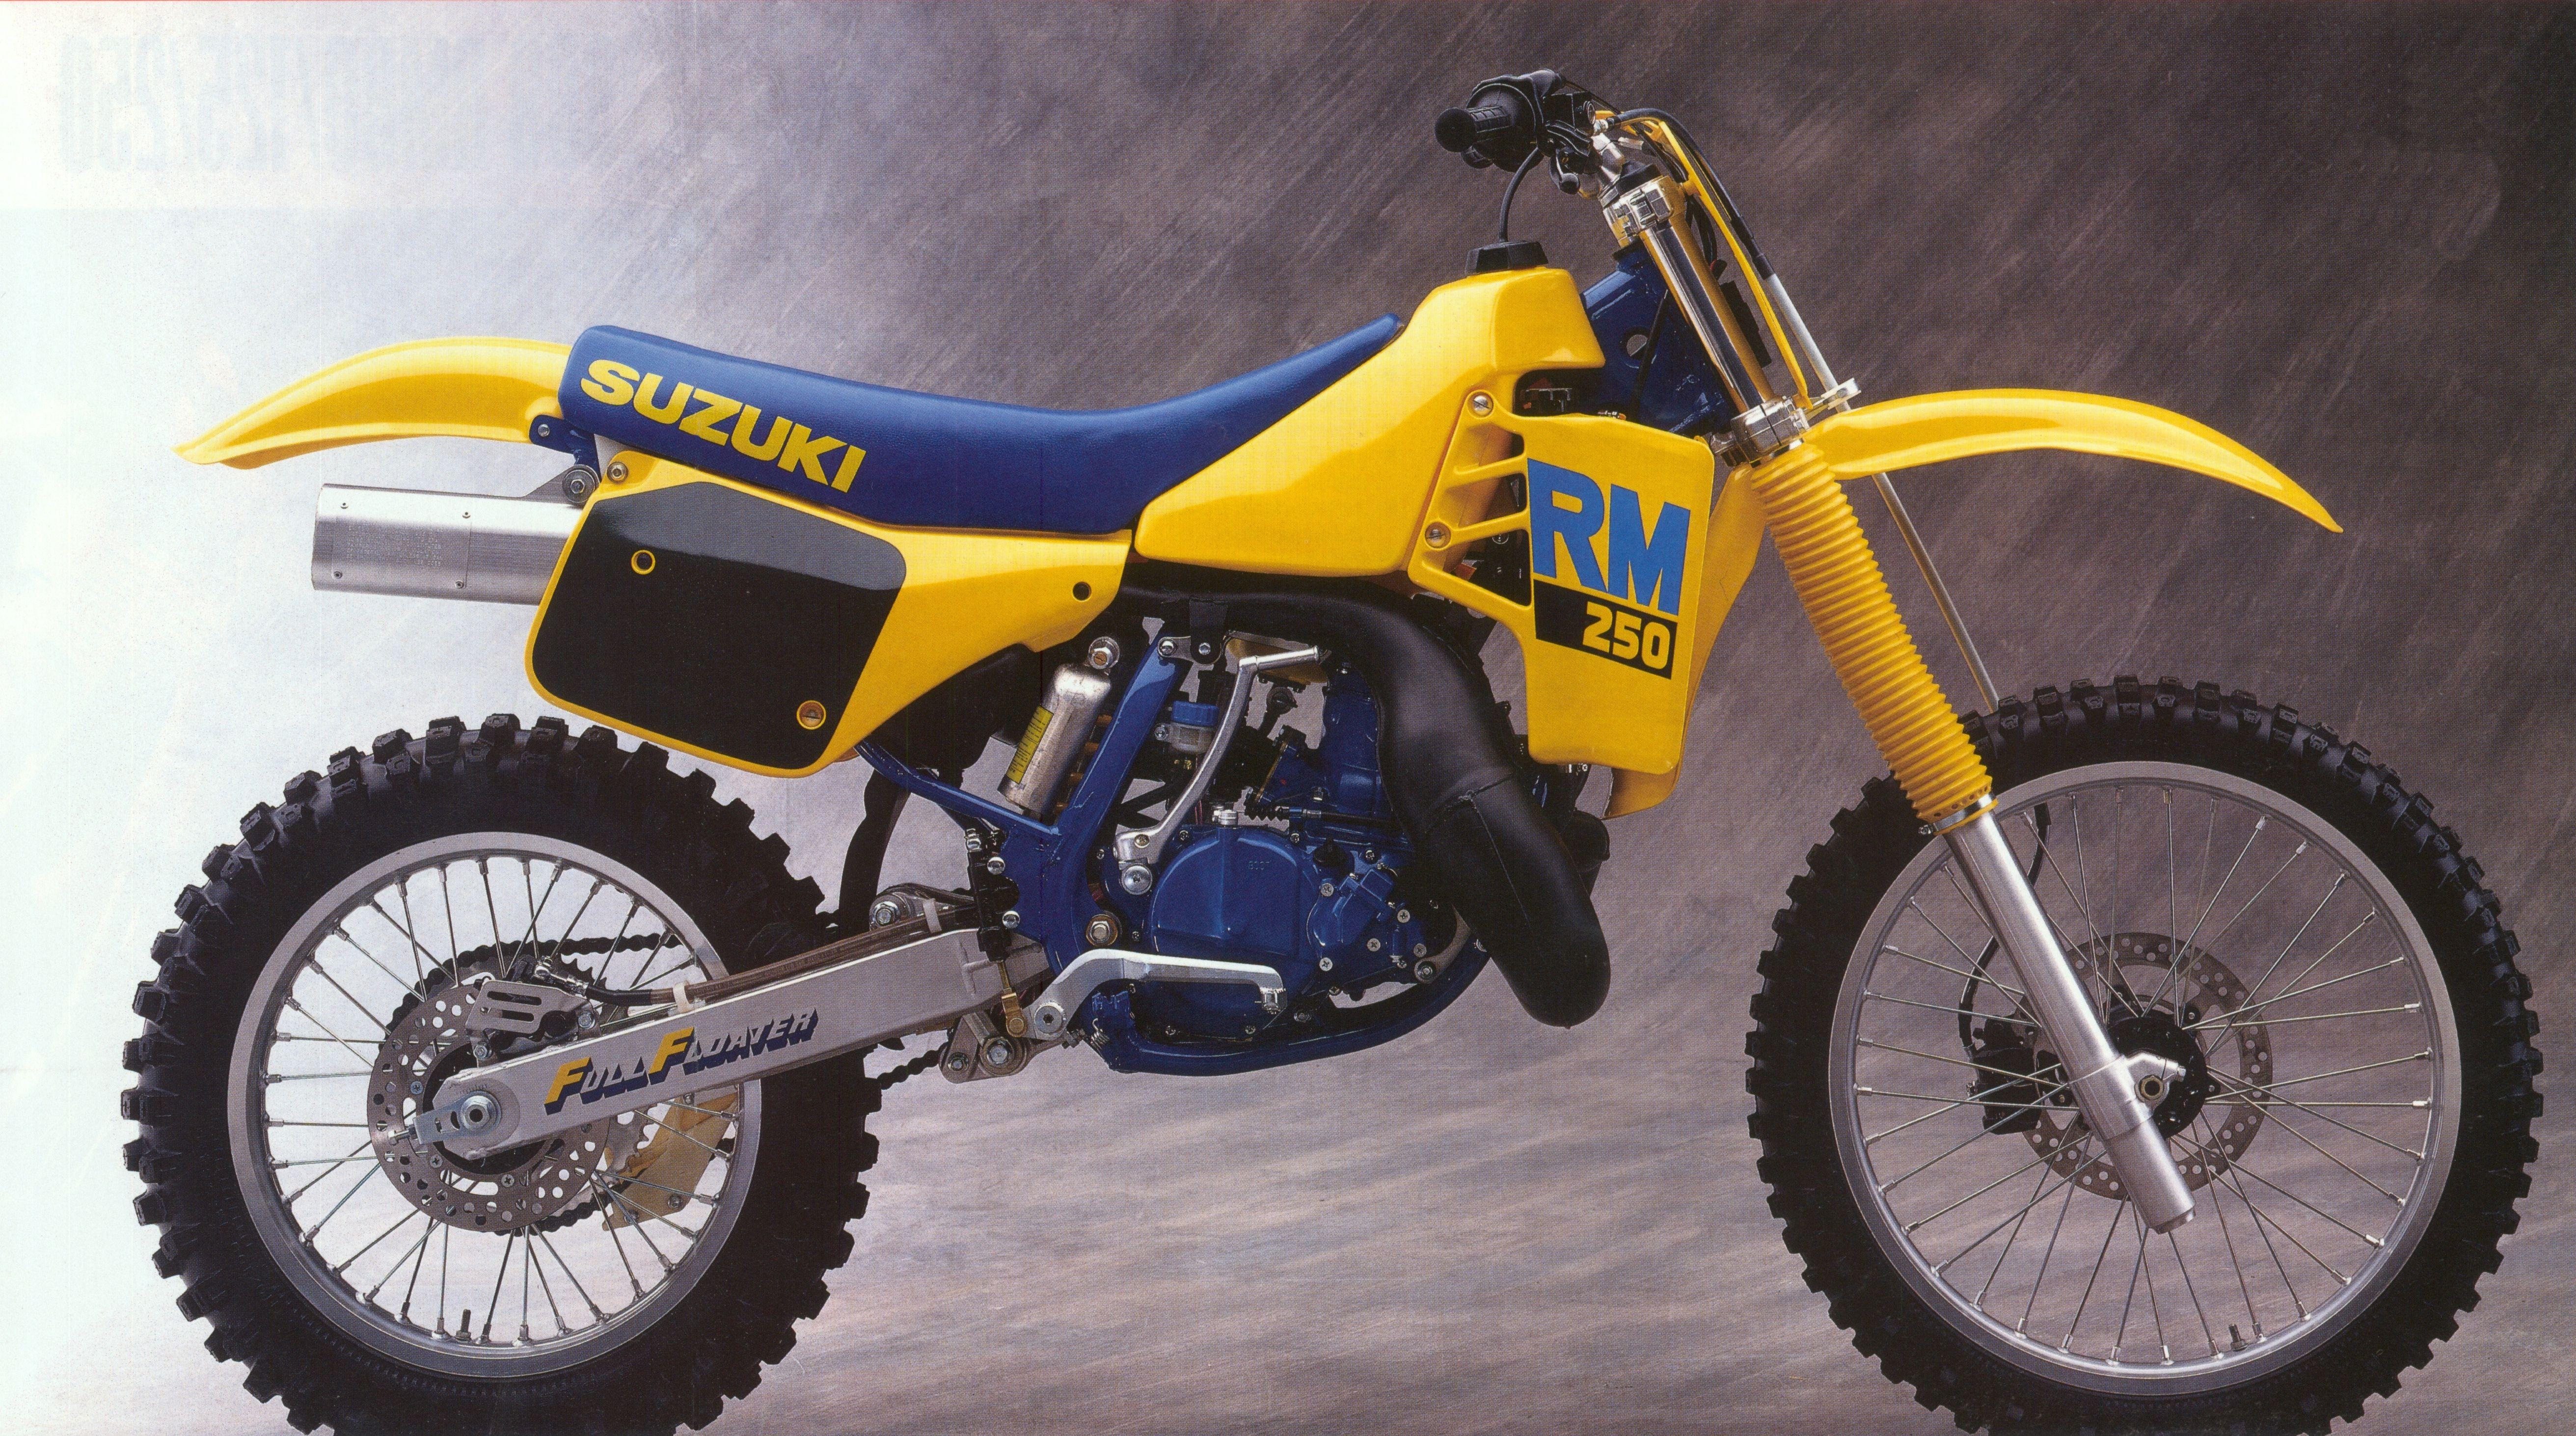 1983 suzuki rm250 ad vintage dirt pinterest dirt biking motocross and motocross bikes